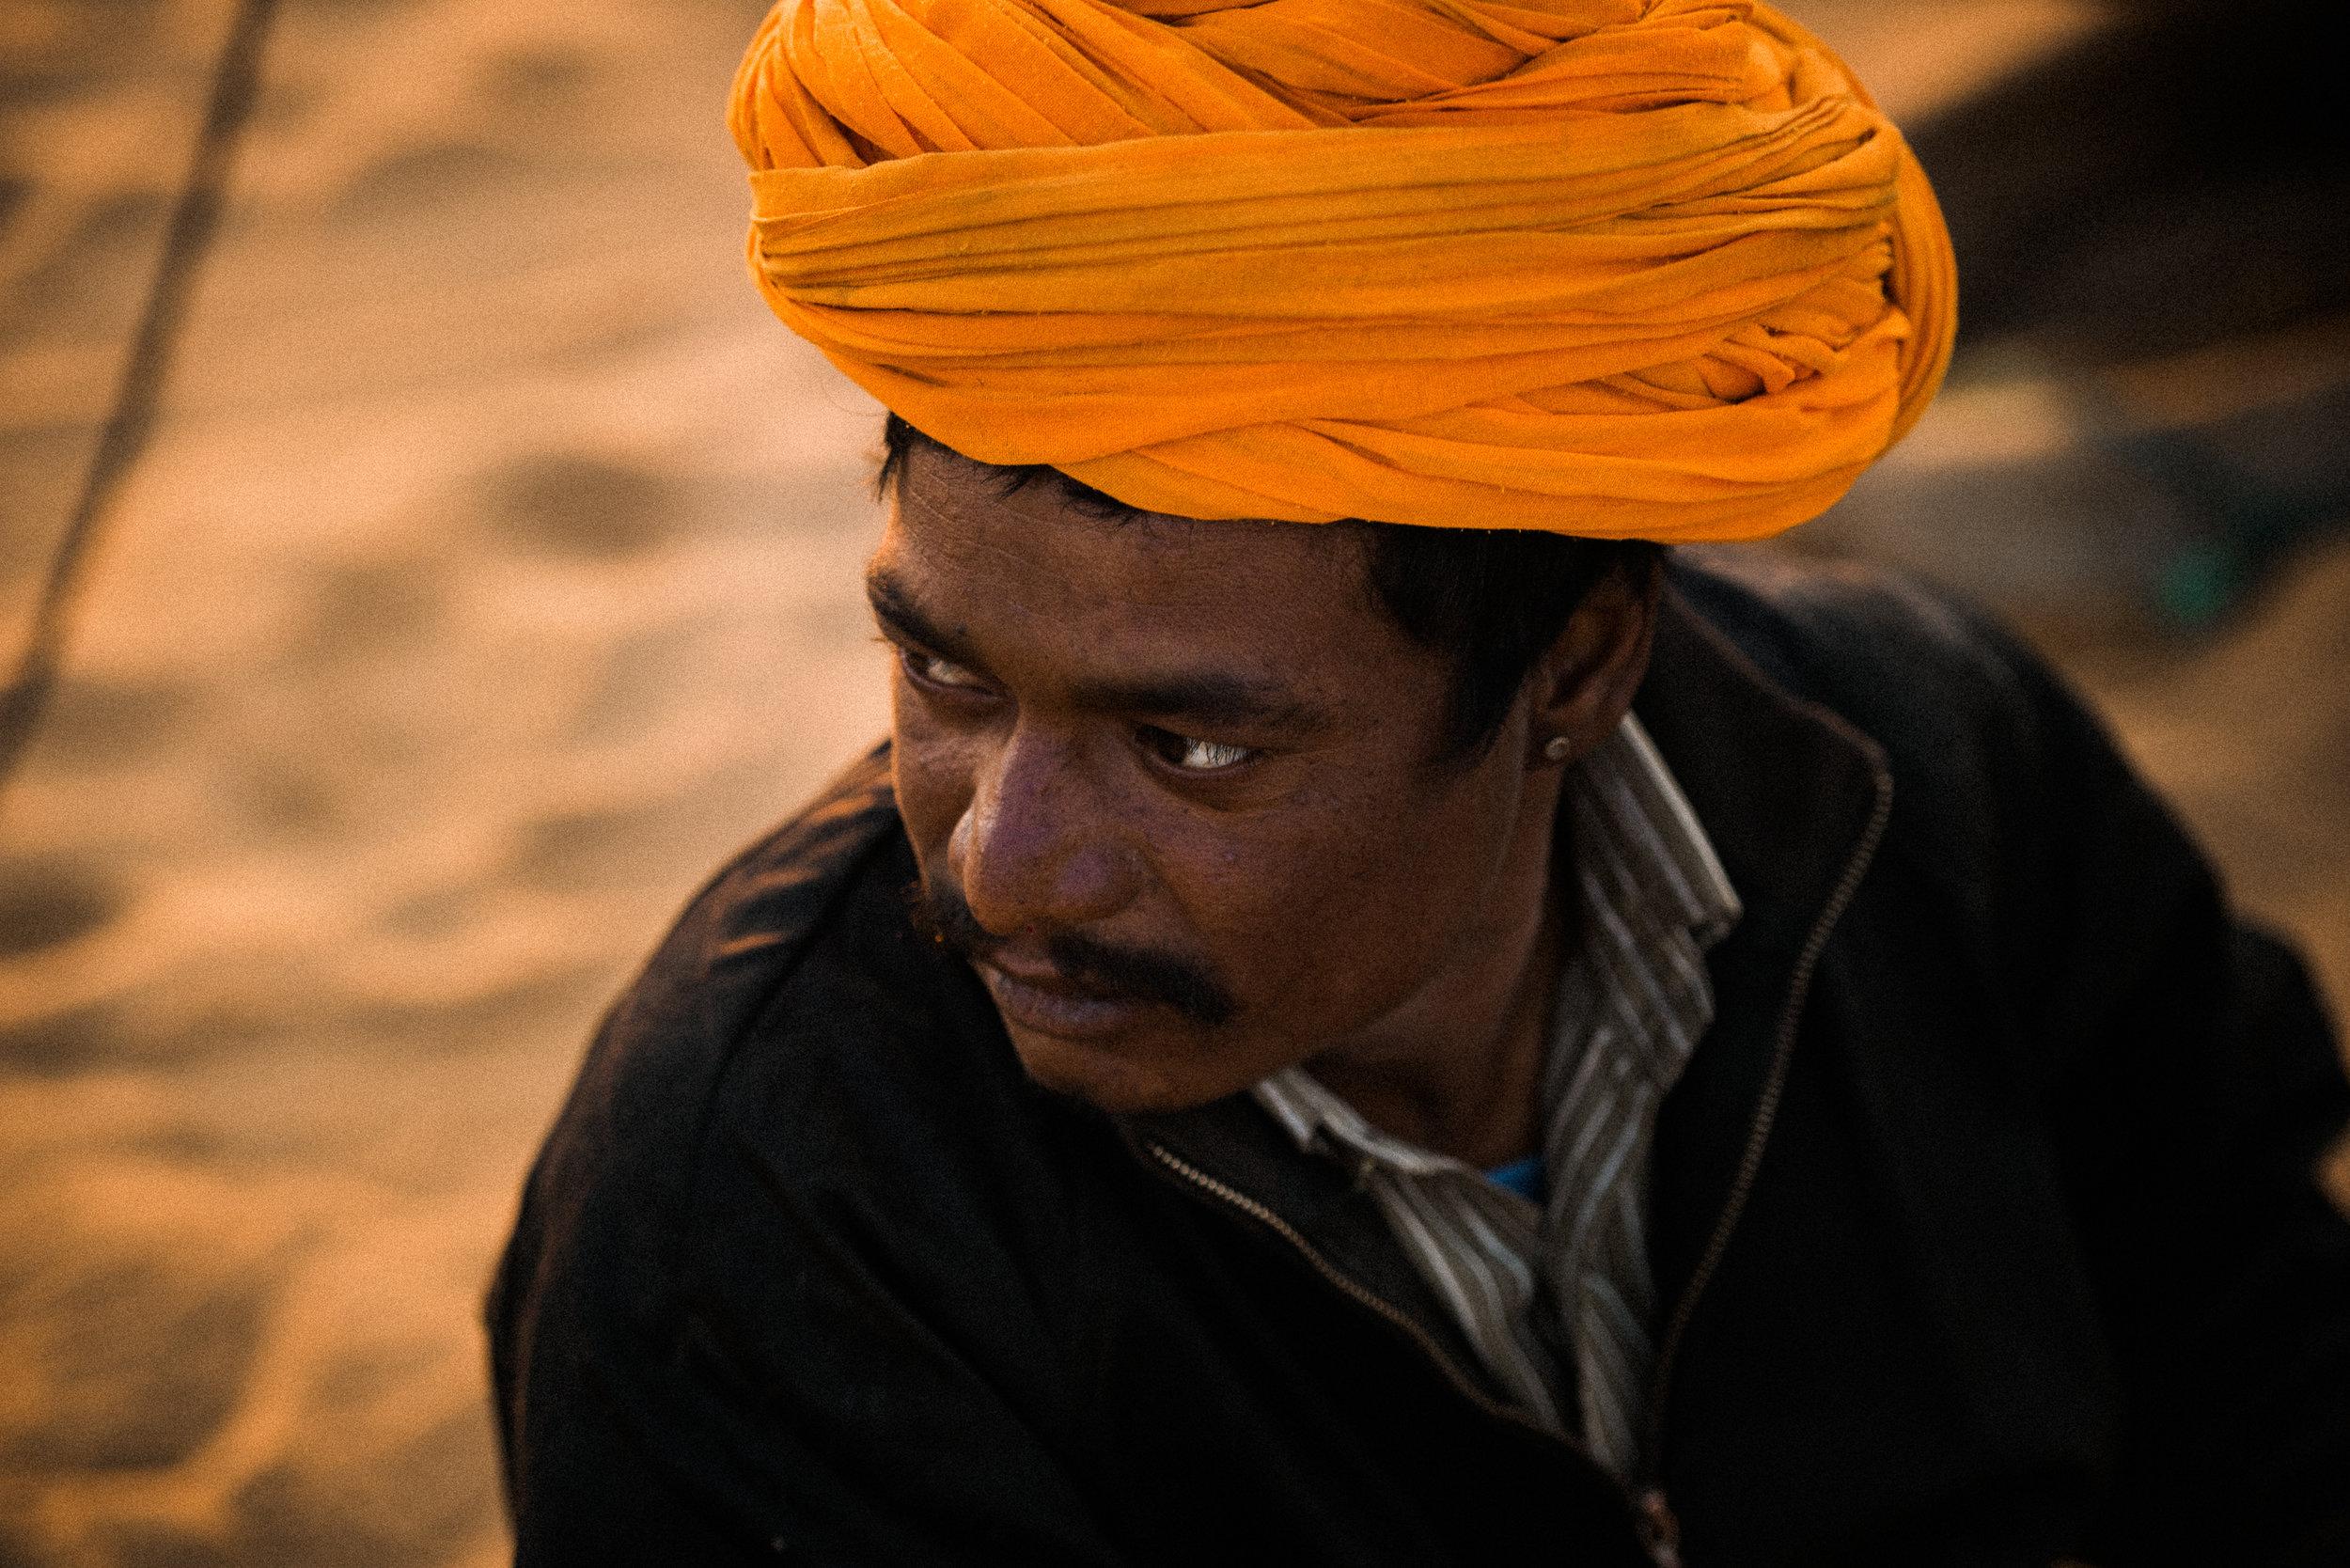 Pushkar_India_TaraShupe_Photography_070.jpg